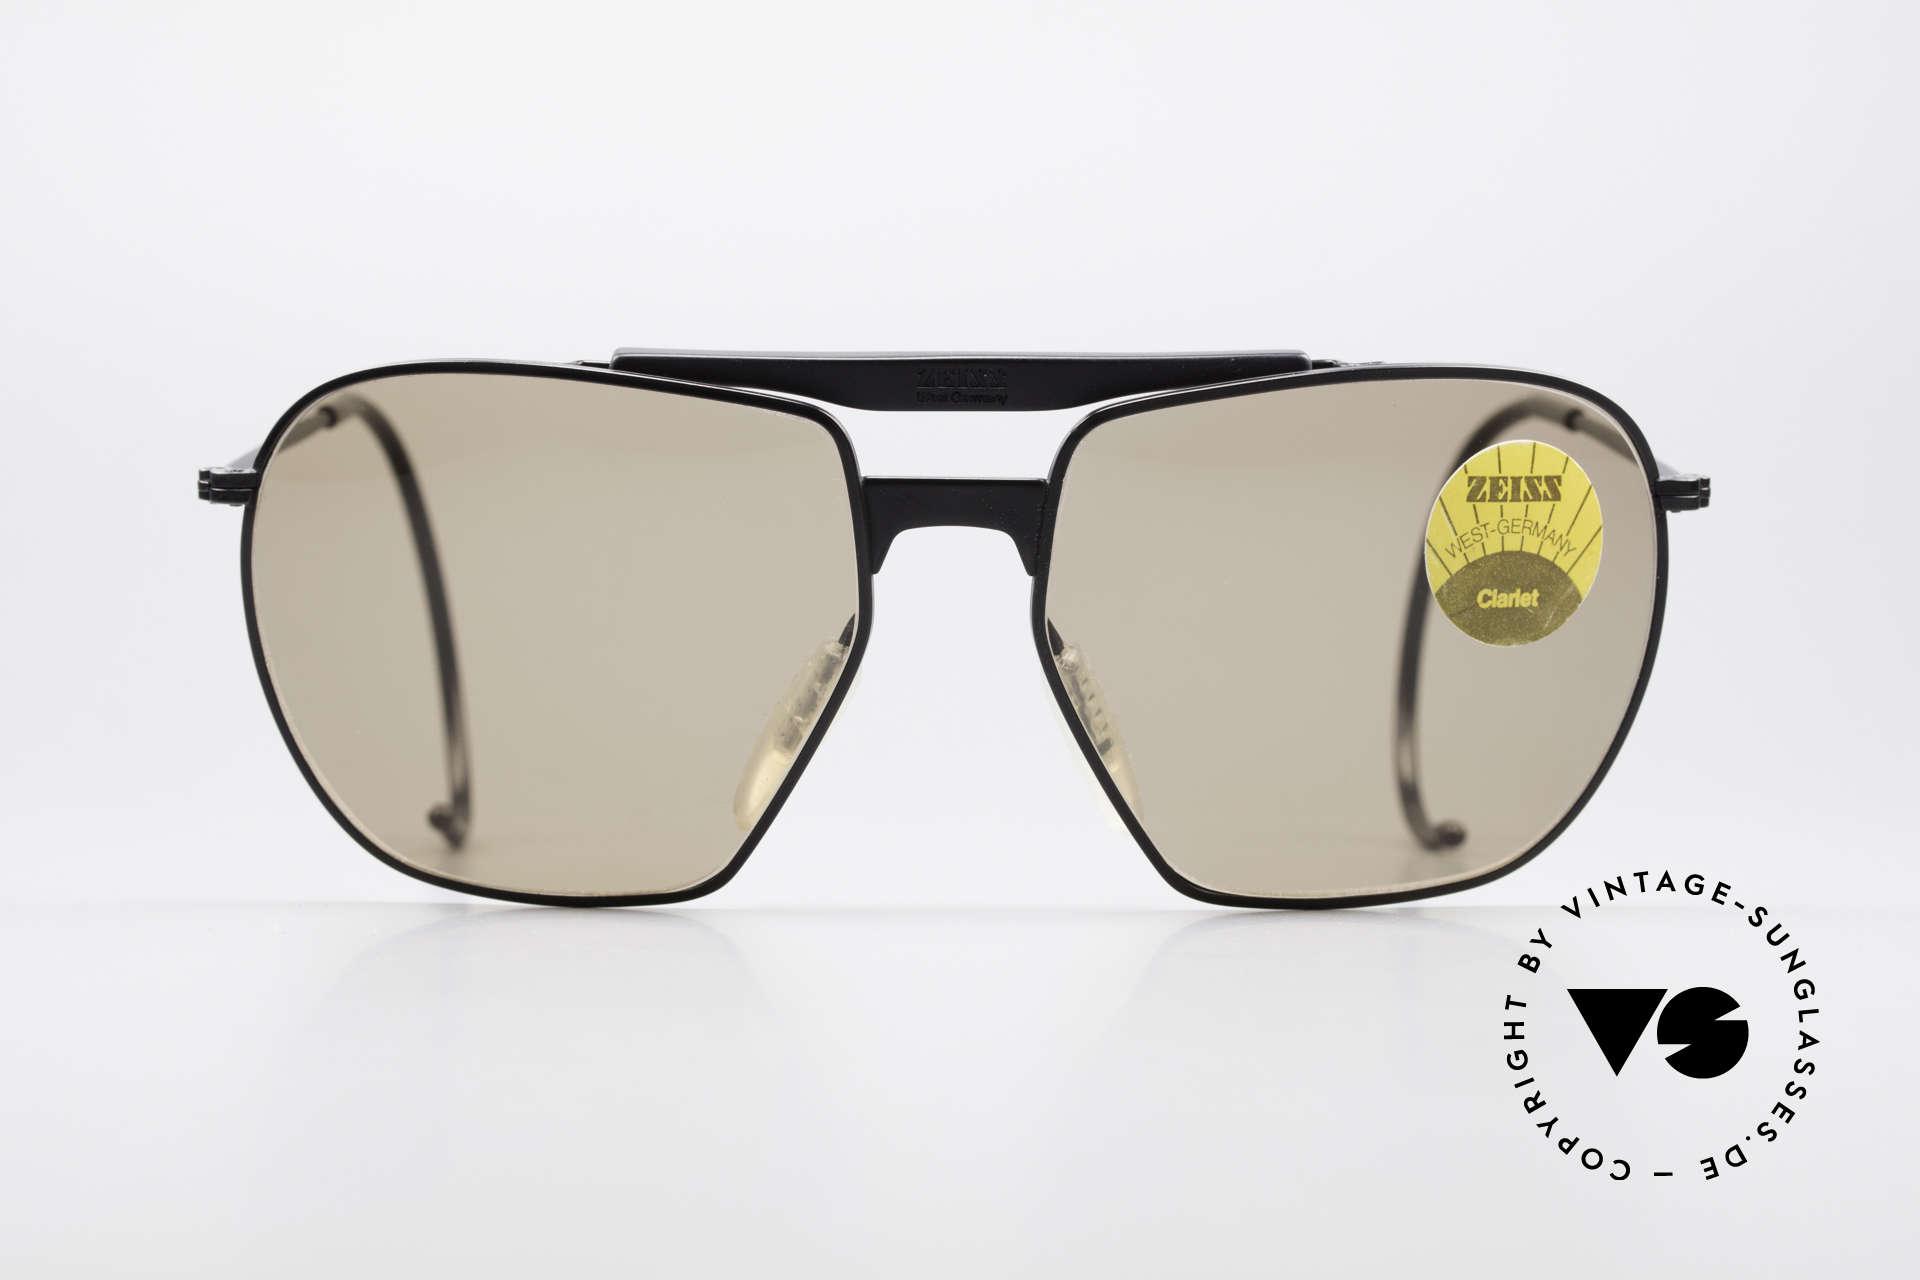 Zeiss 9911 Sport Vintage Sunglasses 80's, perfect gentlemen´s shades, highest wearing-comfort, Made for Men